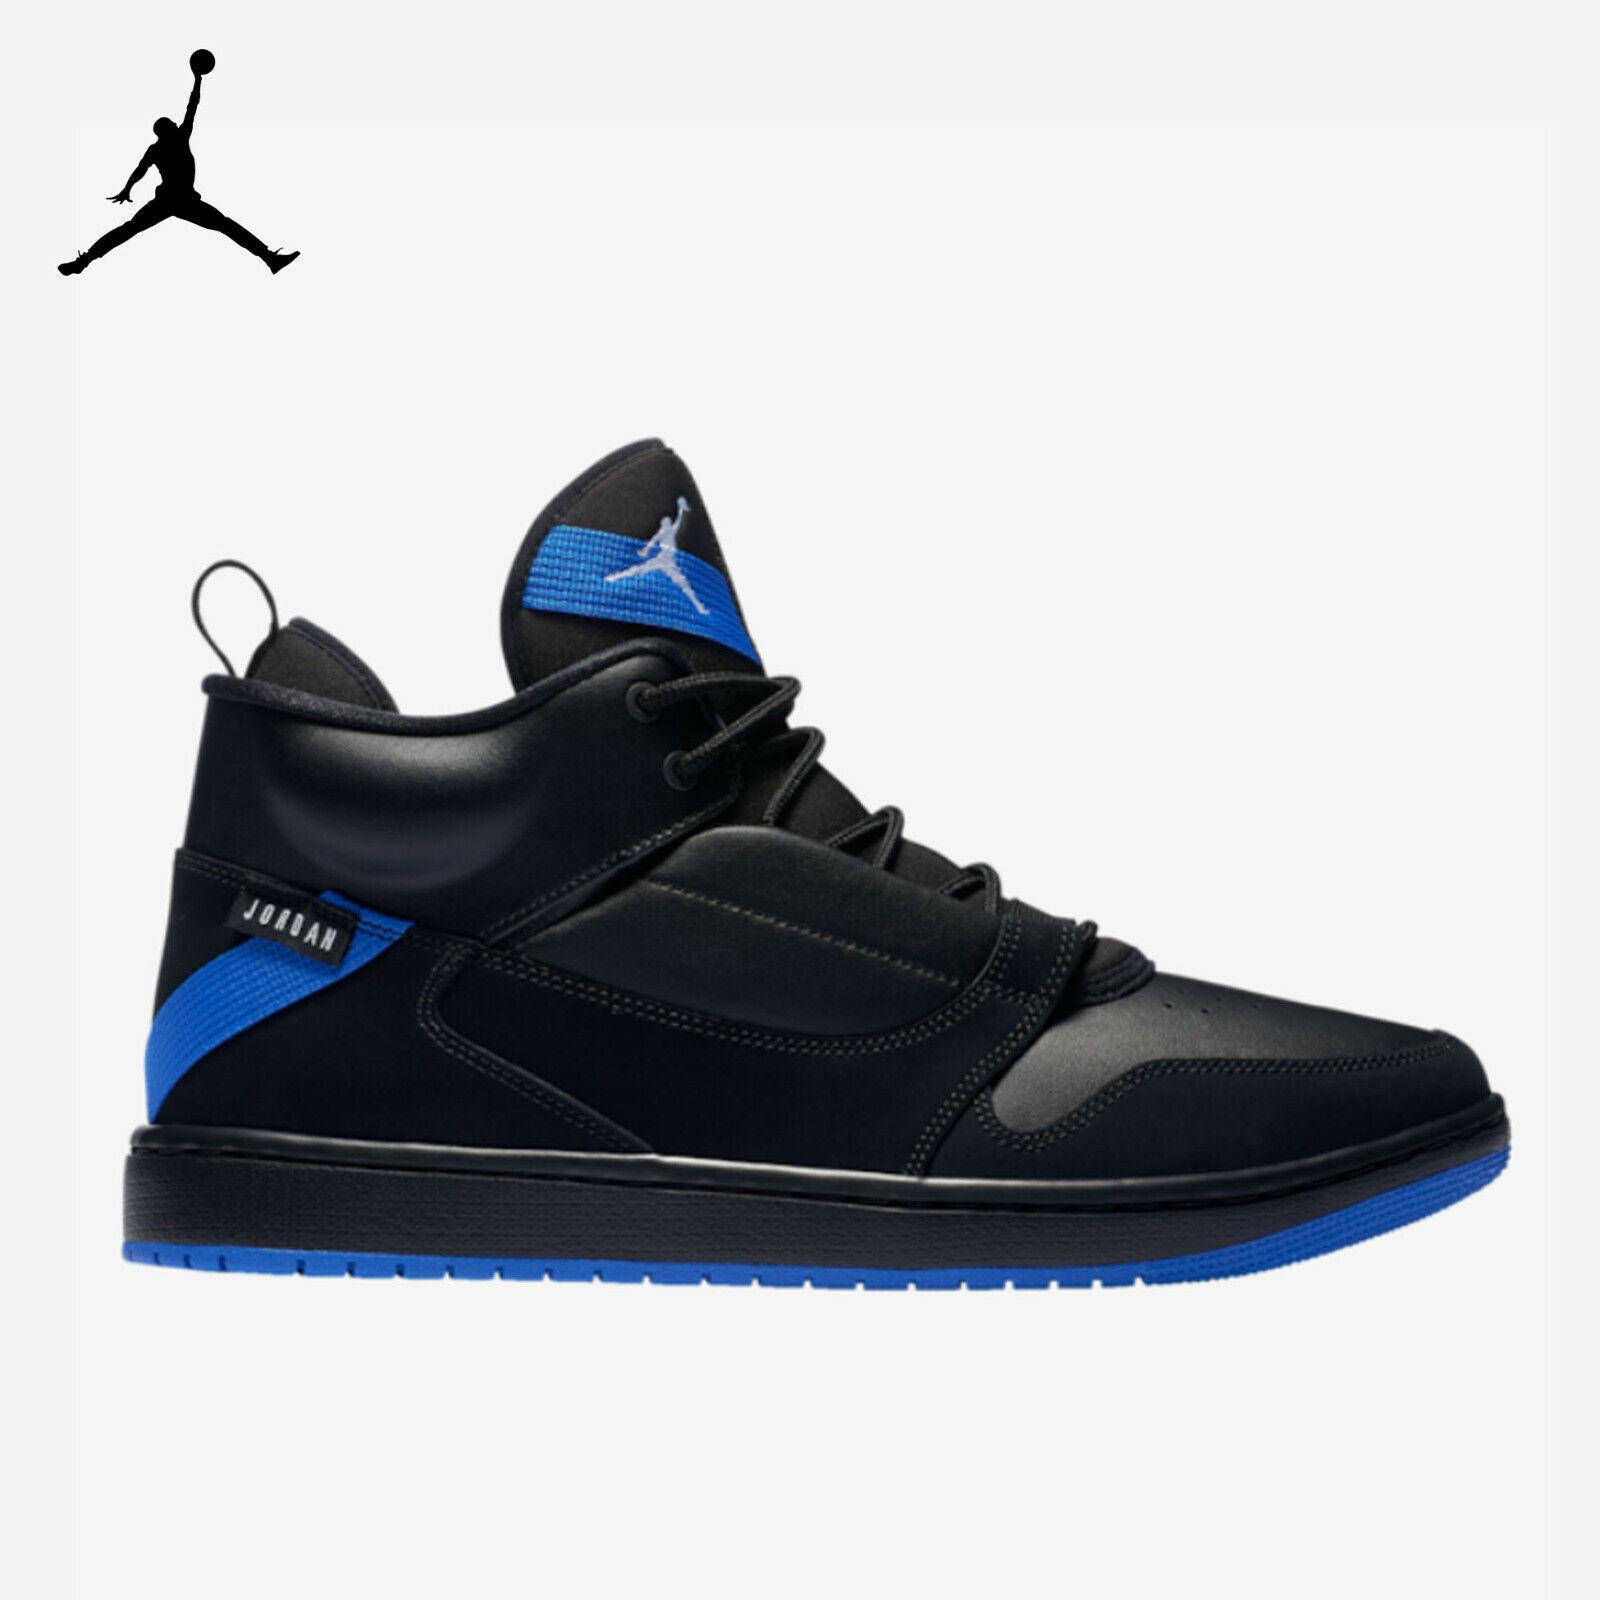 Para hombres Cuero Superior Jordan Fadeaway Negro Hyper Royal (AO1329 041)